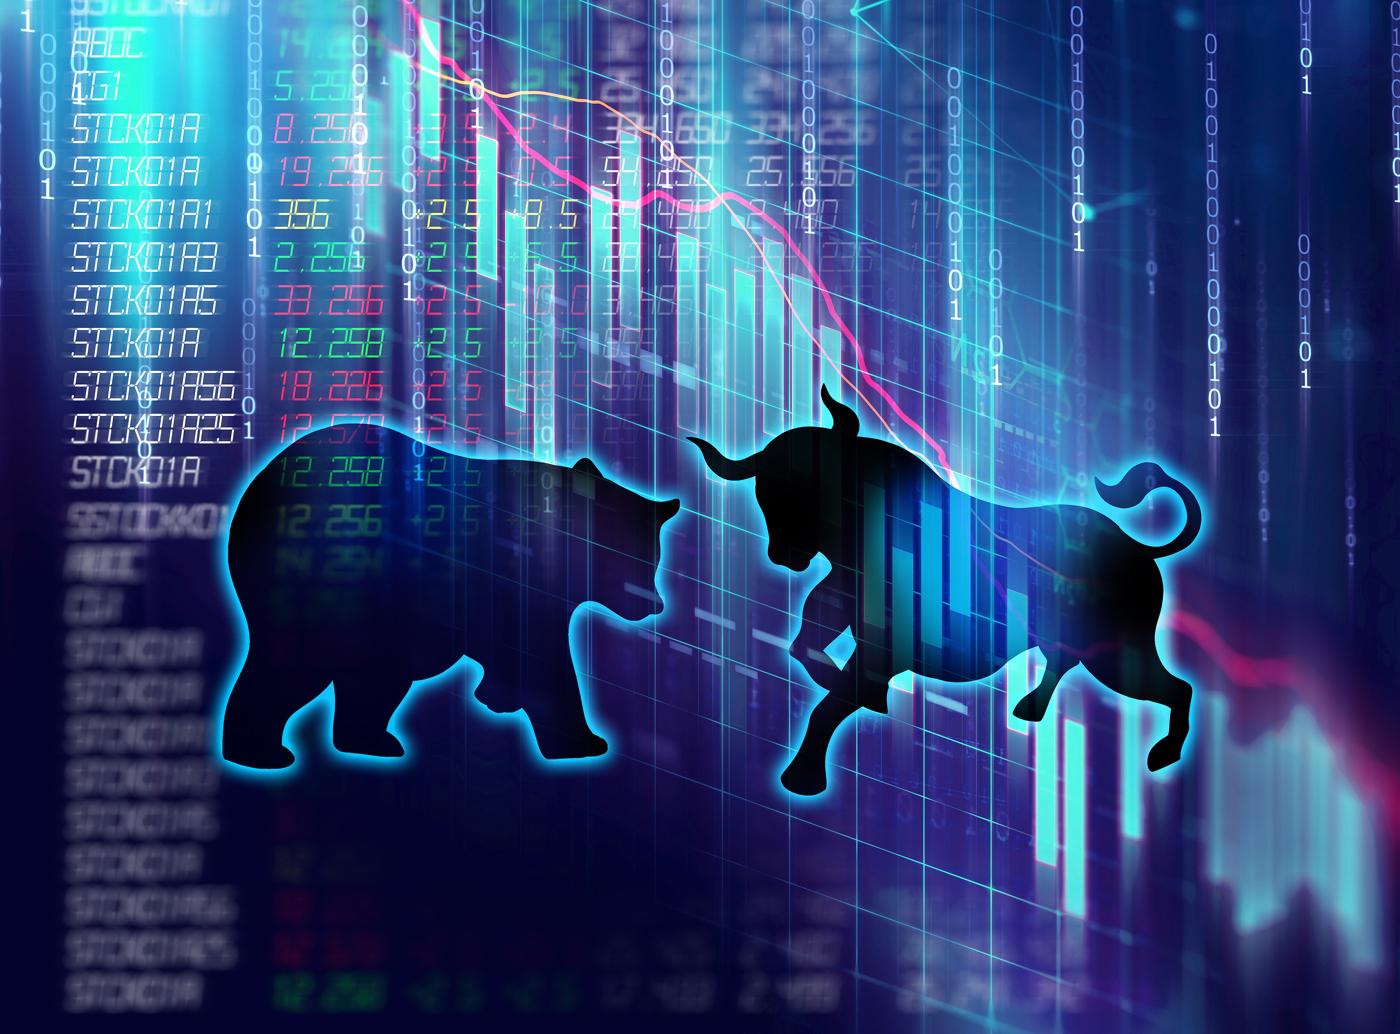 Bull and bear with purple and blue, Bullish, Bearish, Stock market